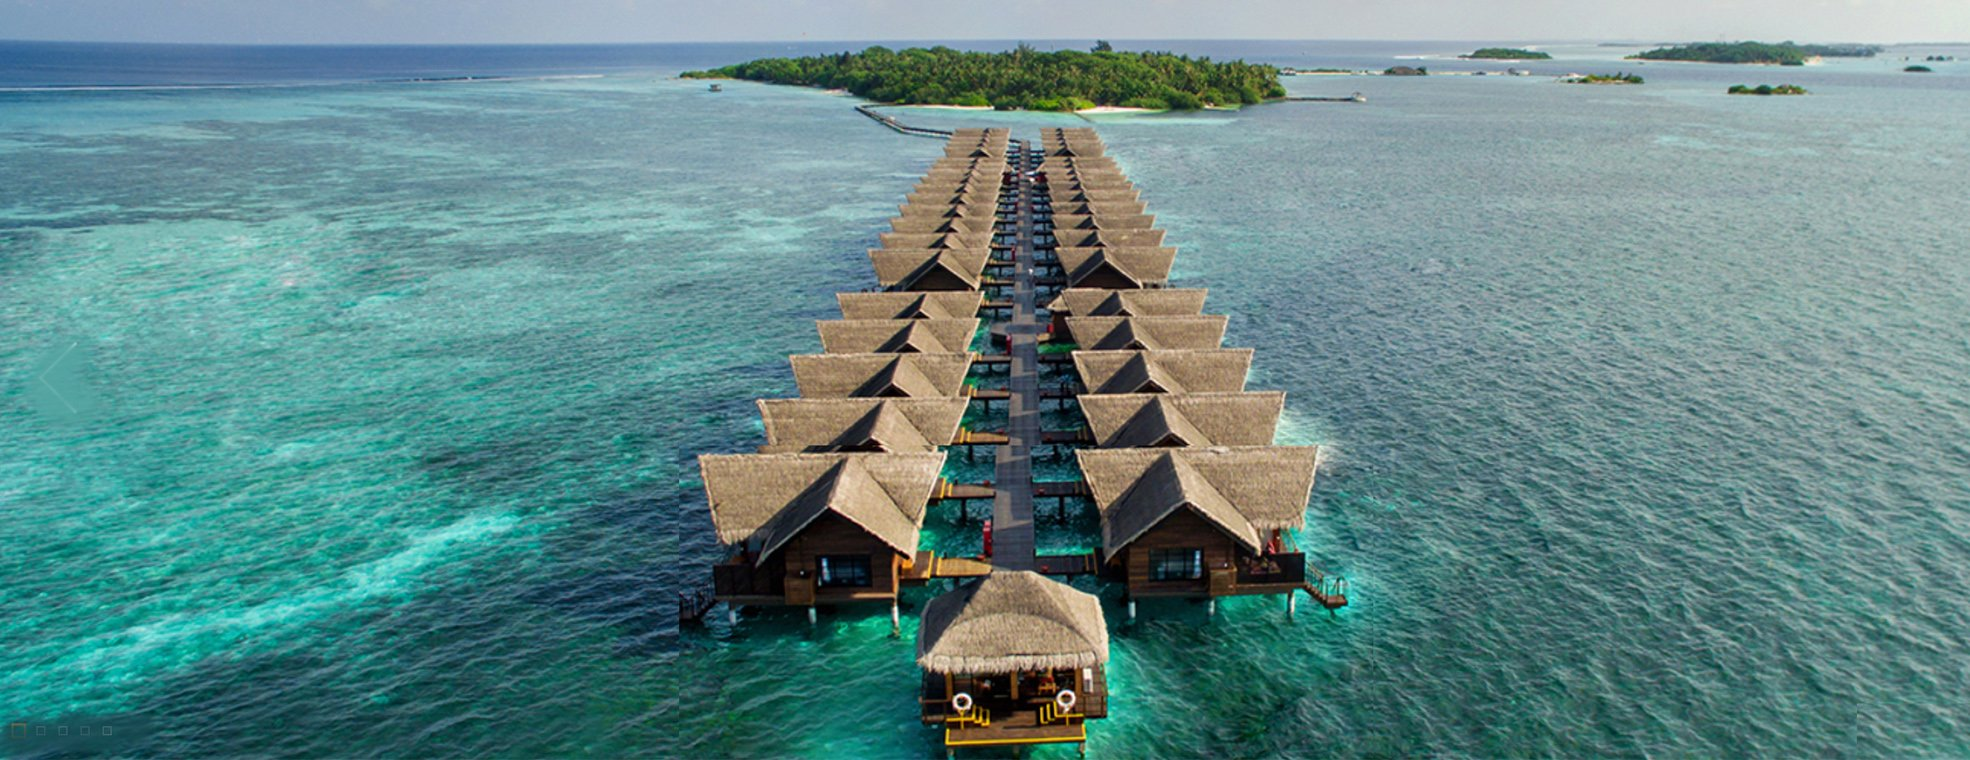 Maldives solo travel group